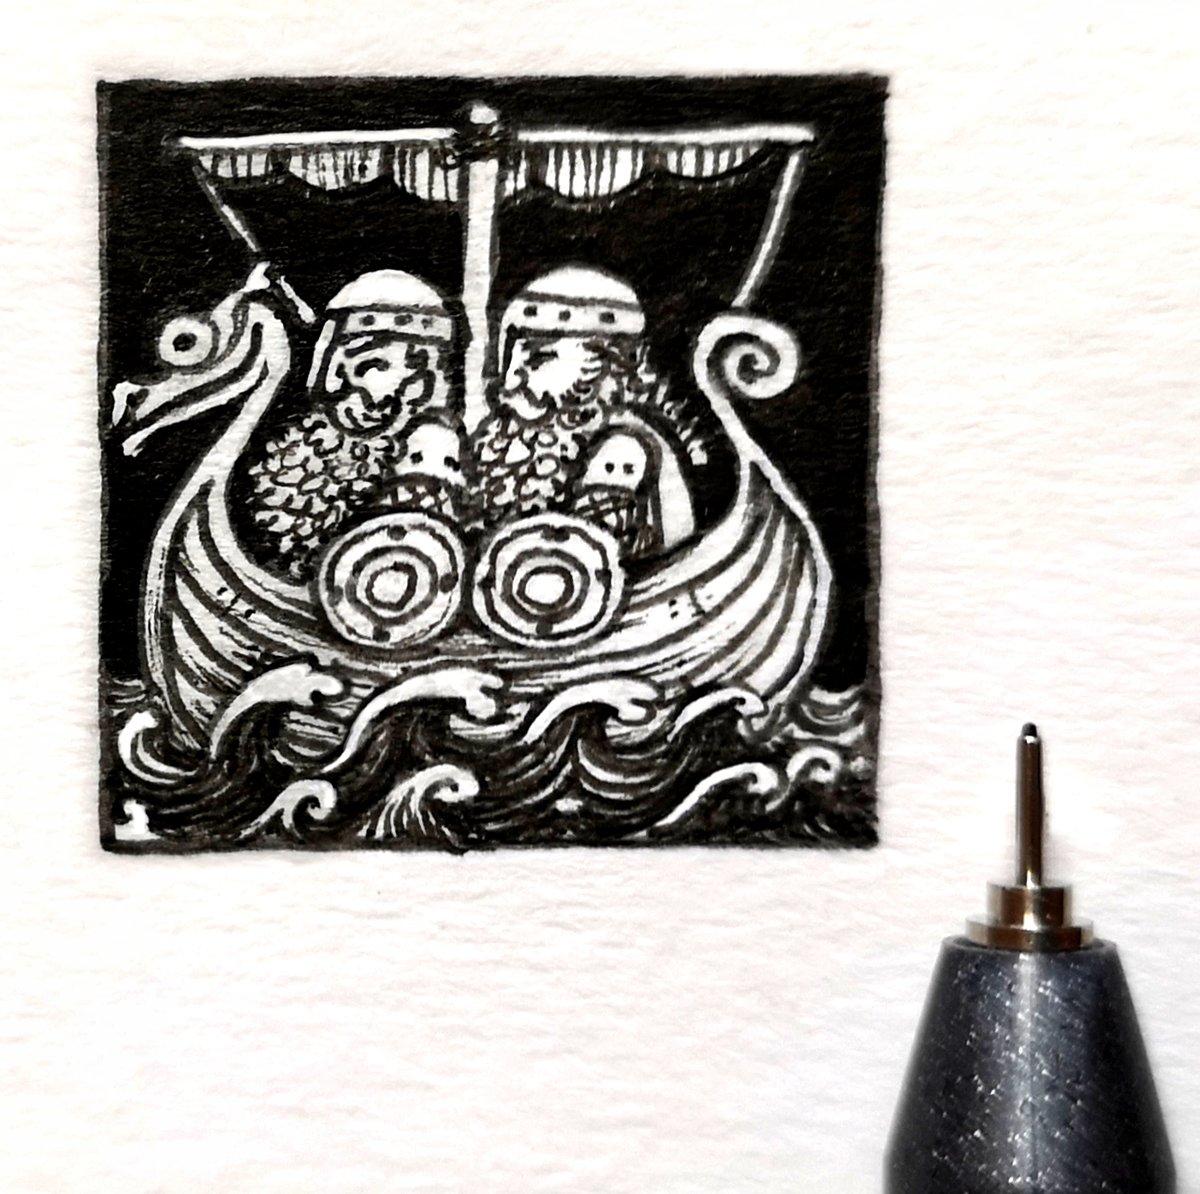 Viking shortboat. #1inchdrawing #dailydrawing #drawdailypic.twitter.com/8cFapzf0Wr